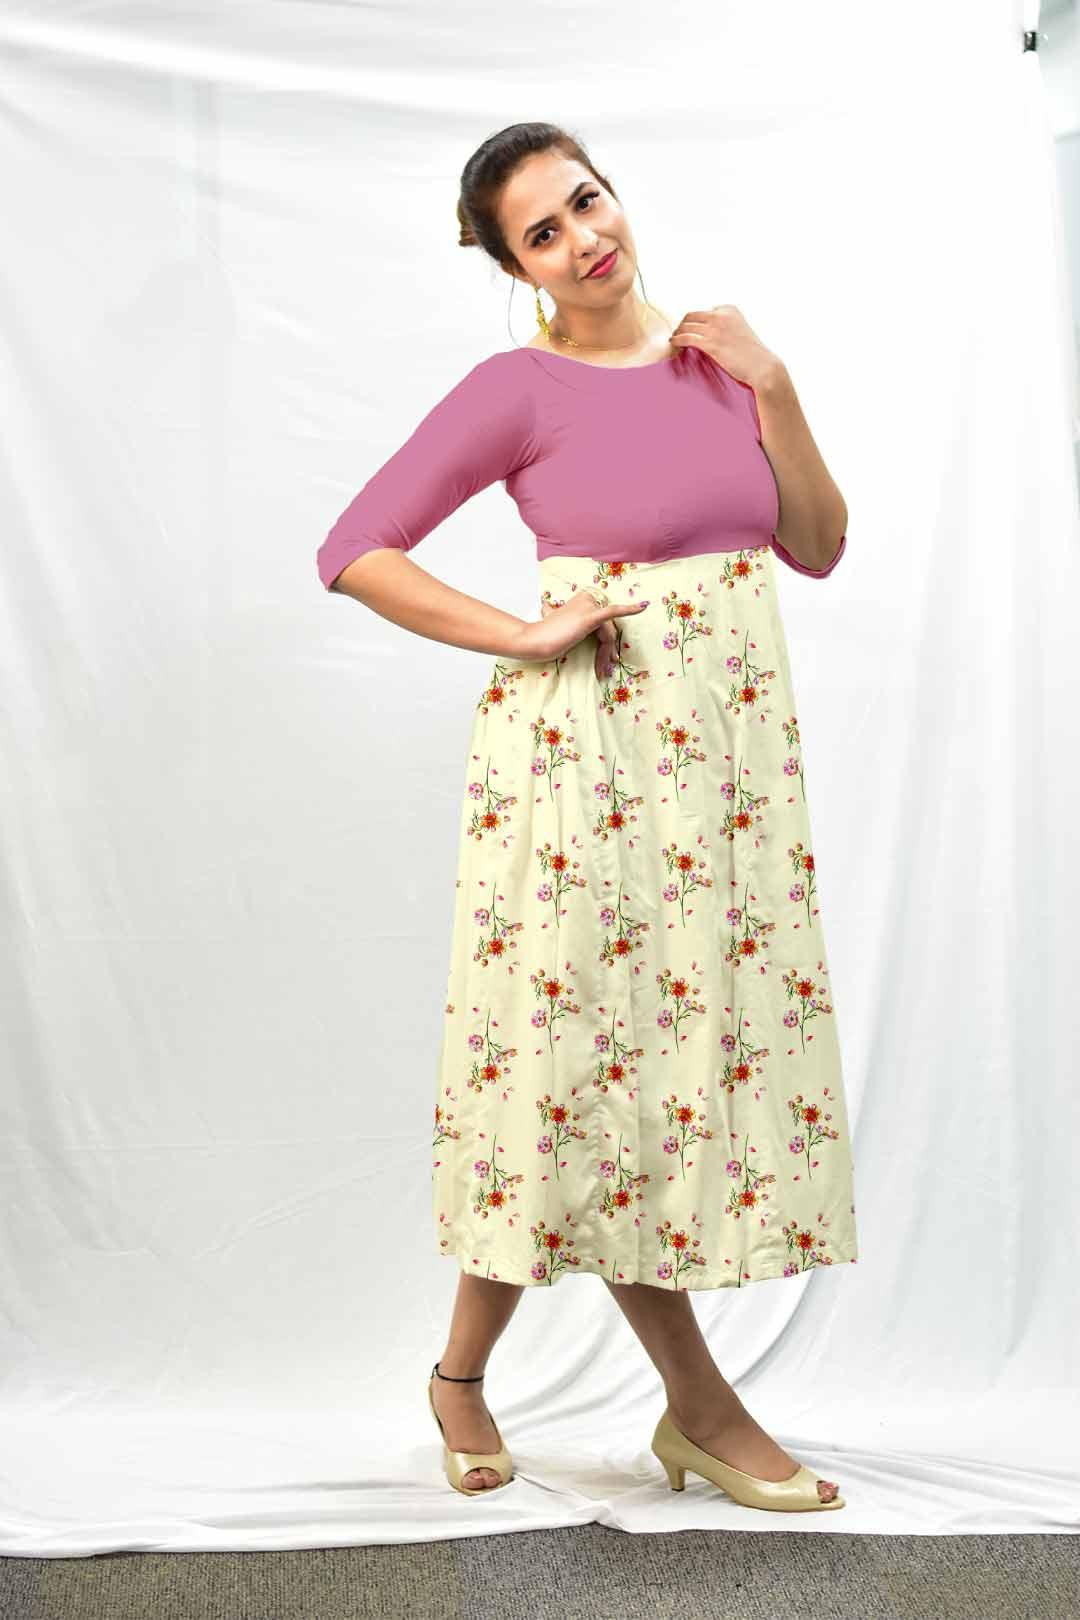 Cotton Frock Style Dress – Upside down